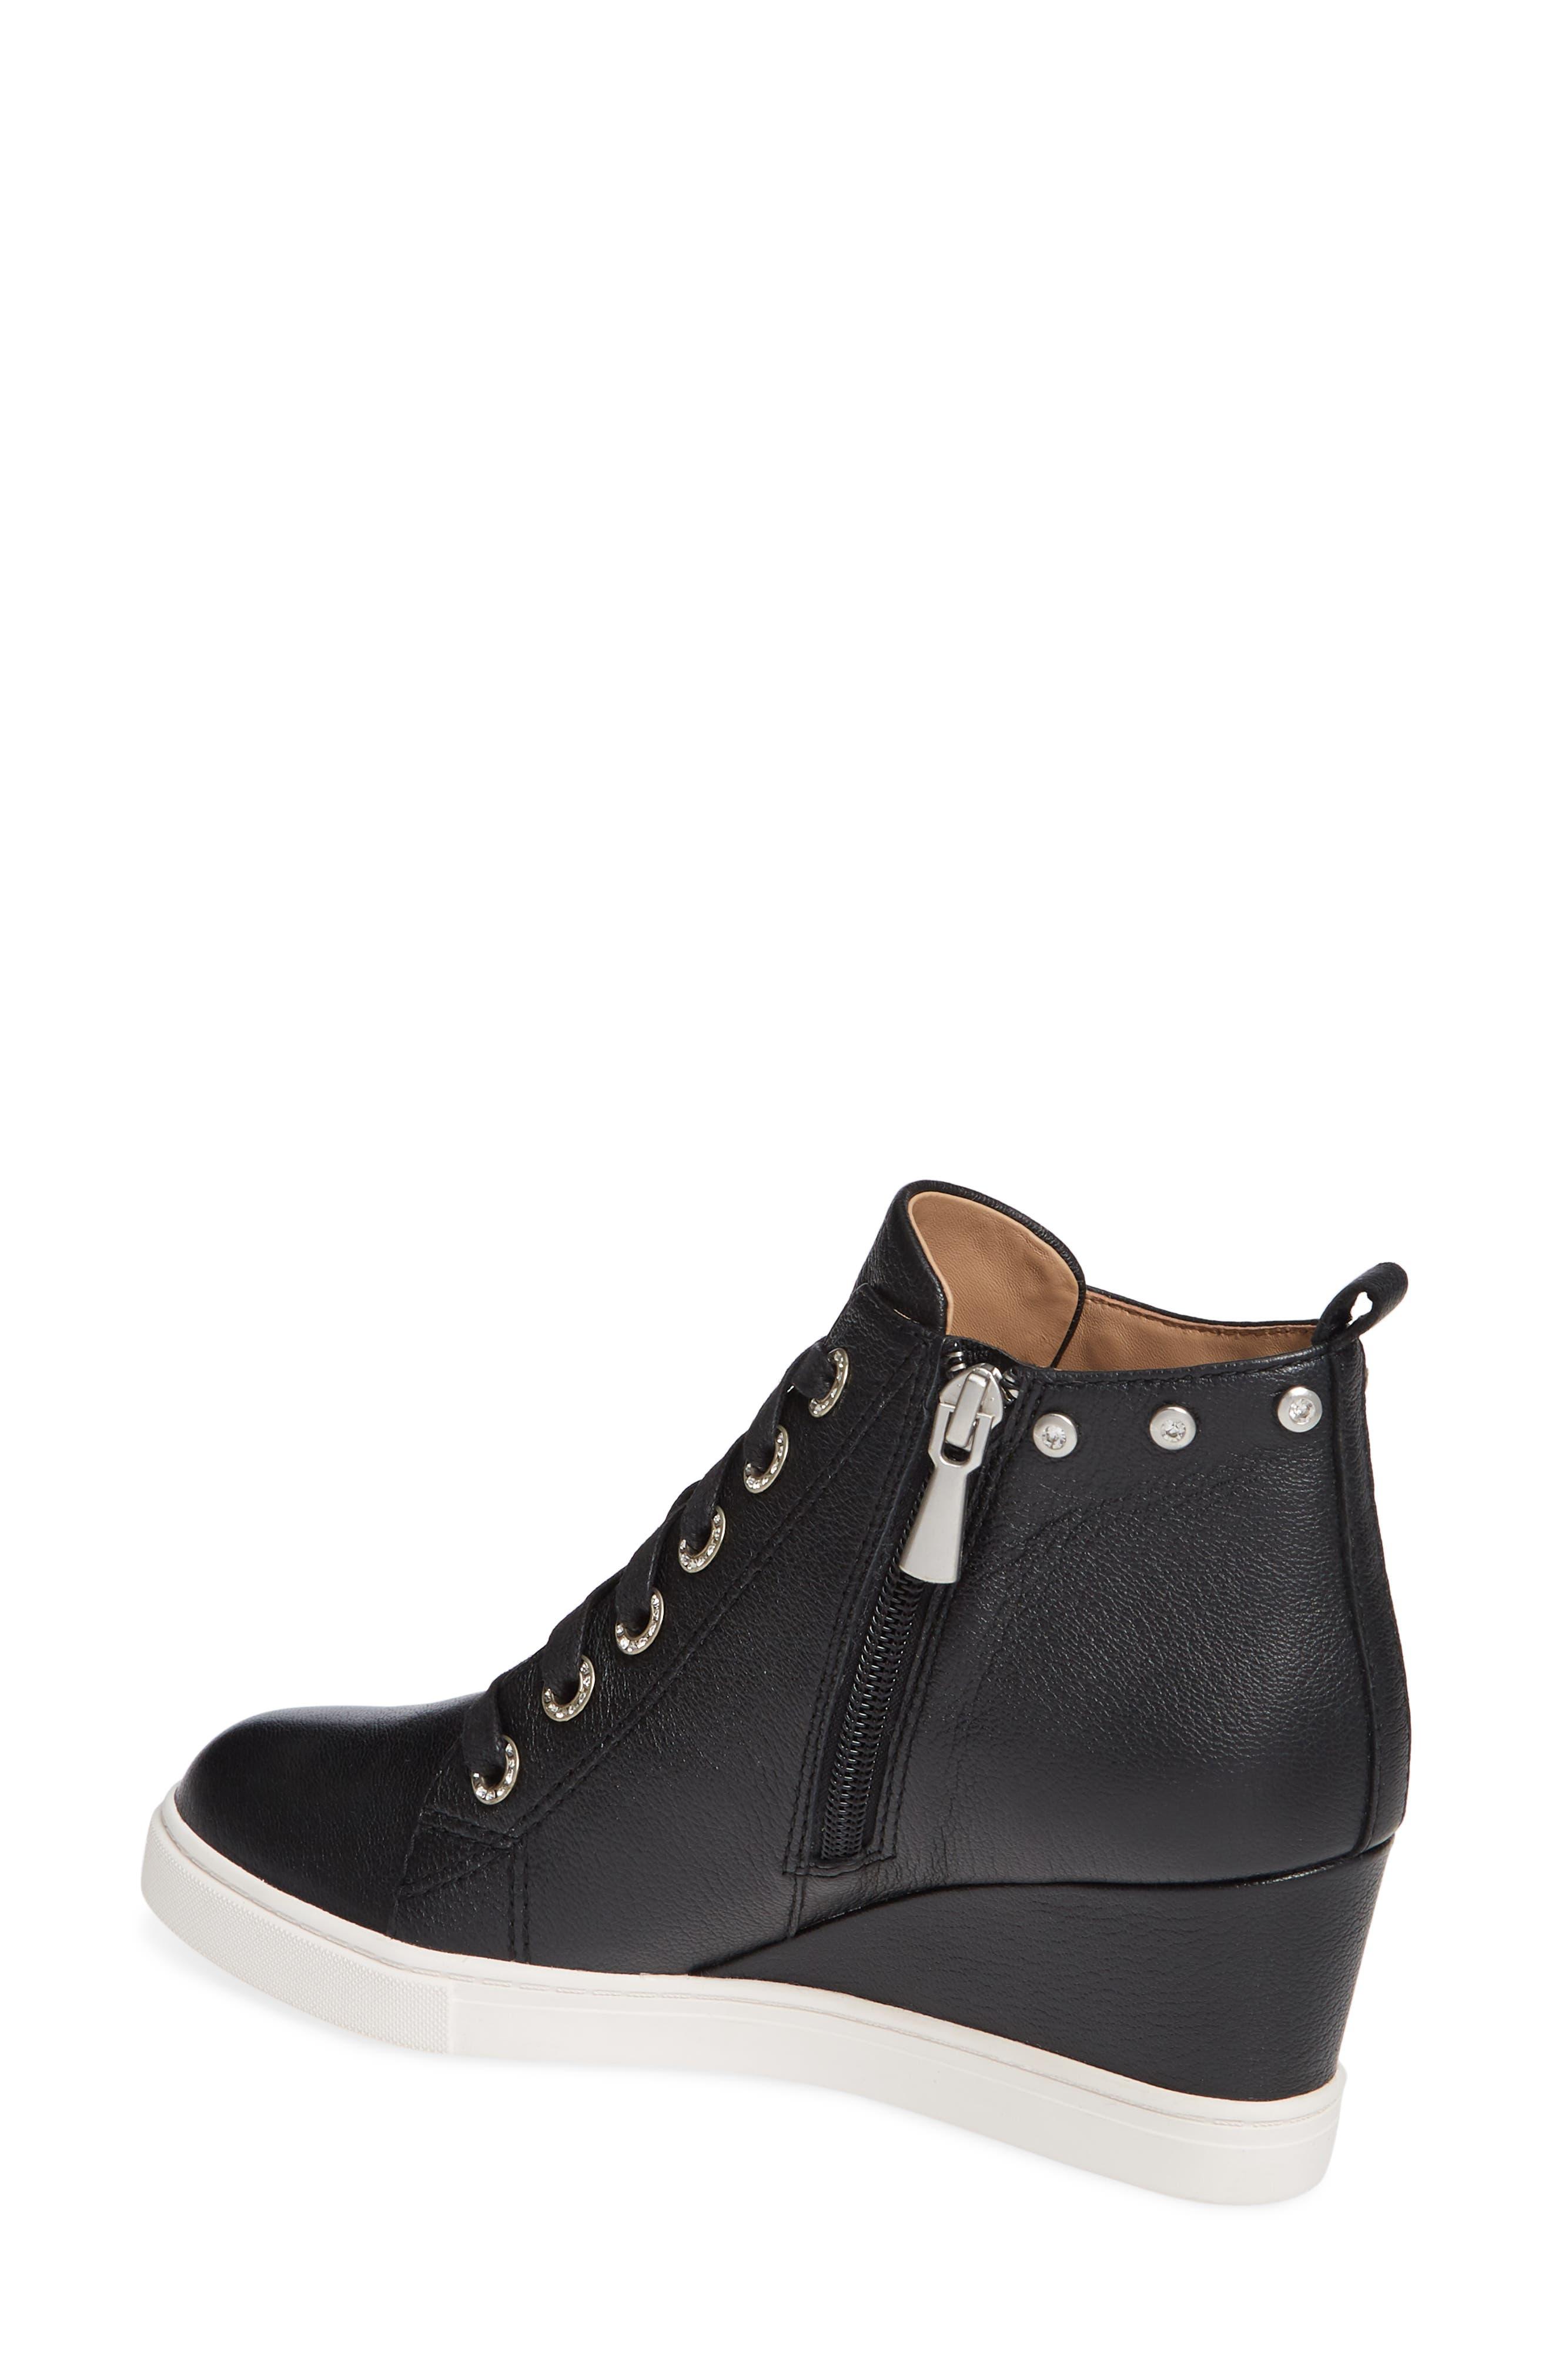 LINEA PAOLO, Flint Wedge Sneaker, Alternate thumbnail 2, color, BLACK LEATHER